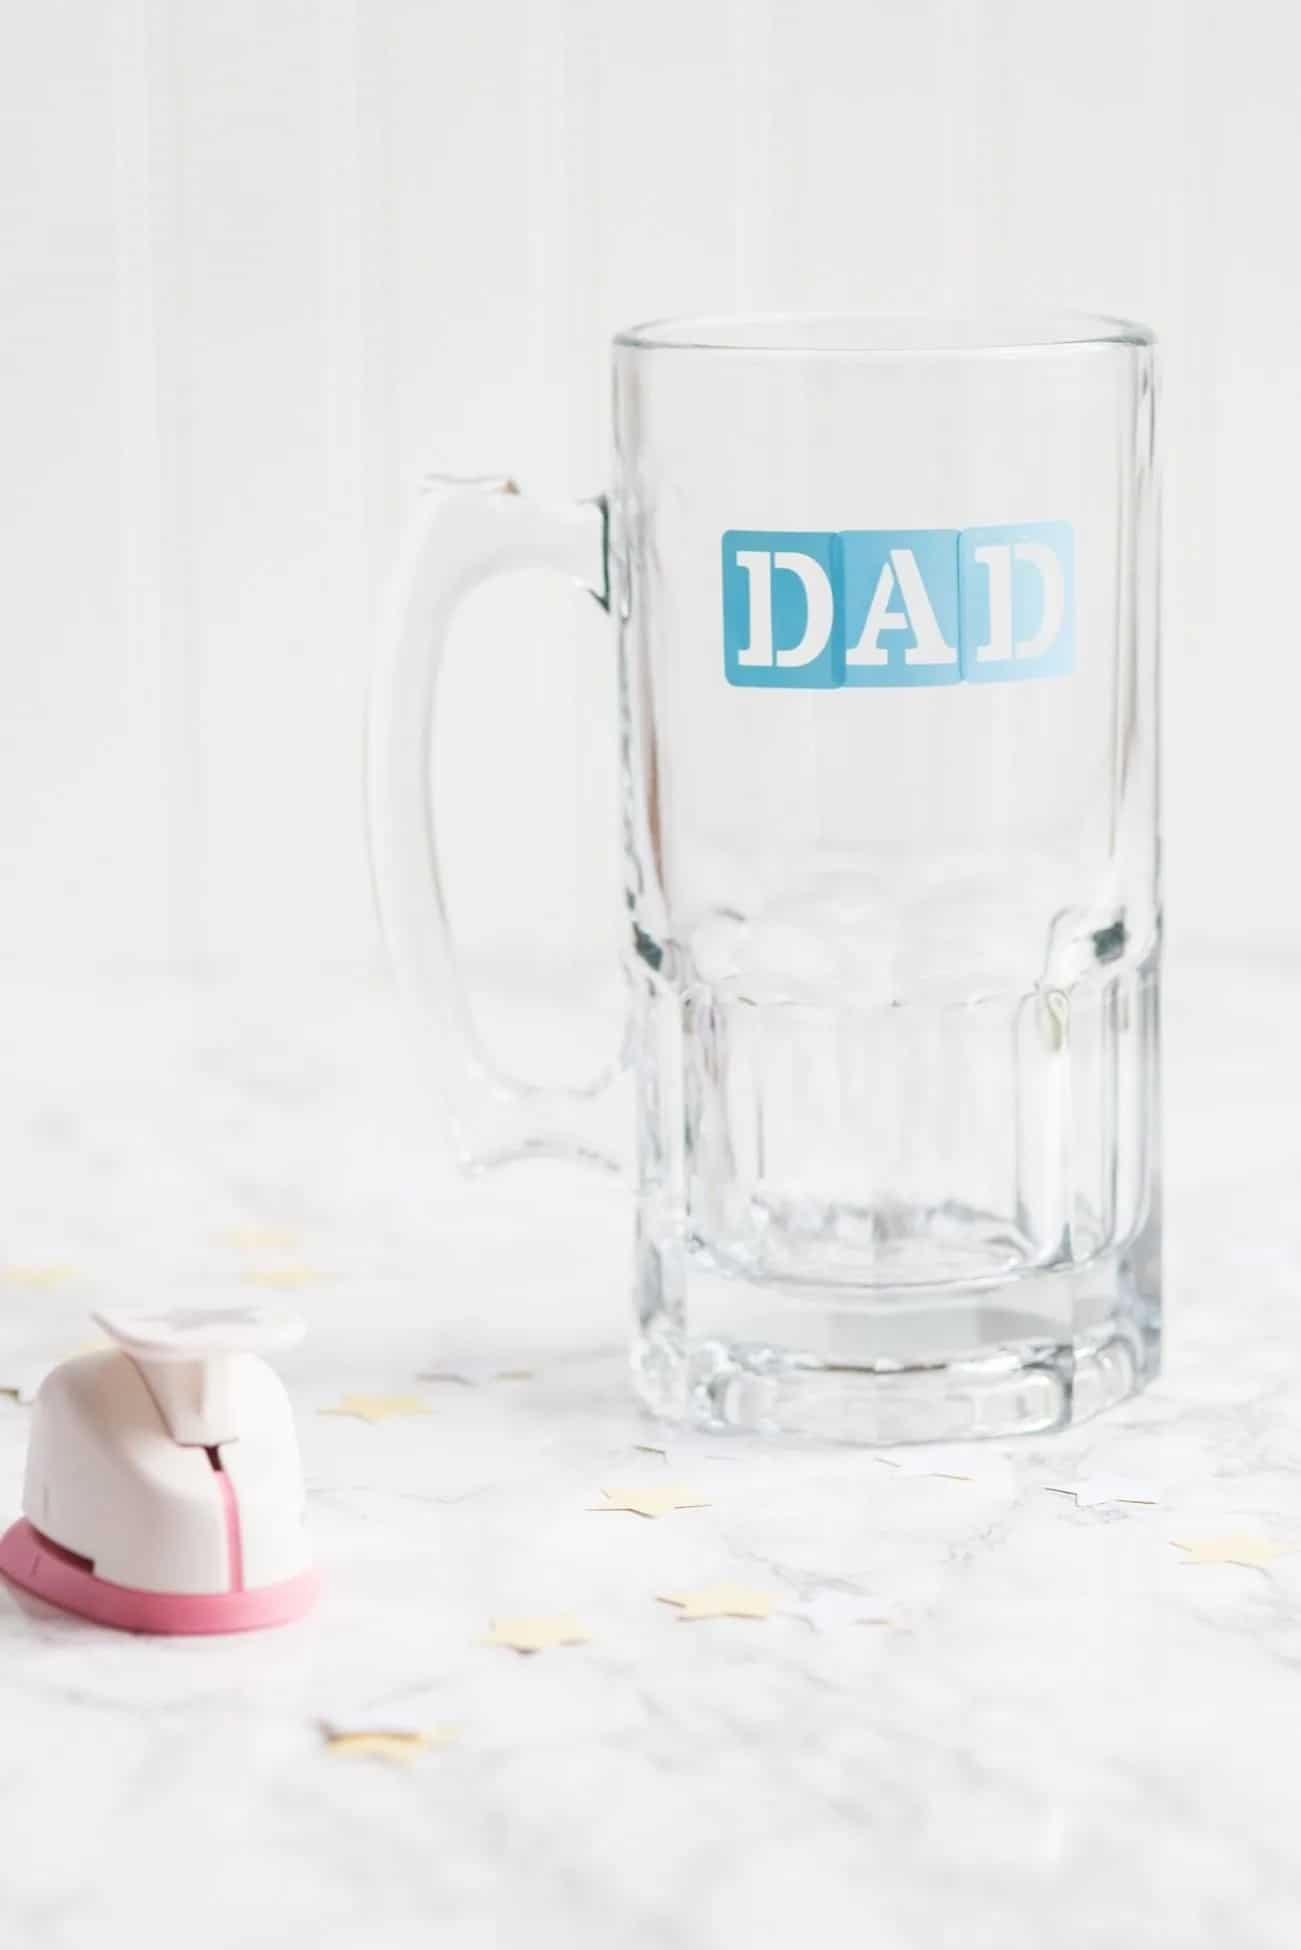 DIY Etched Beer Mugs for Dad